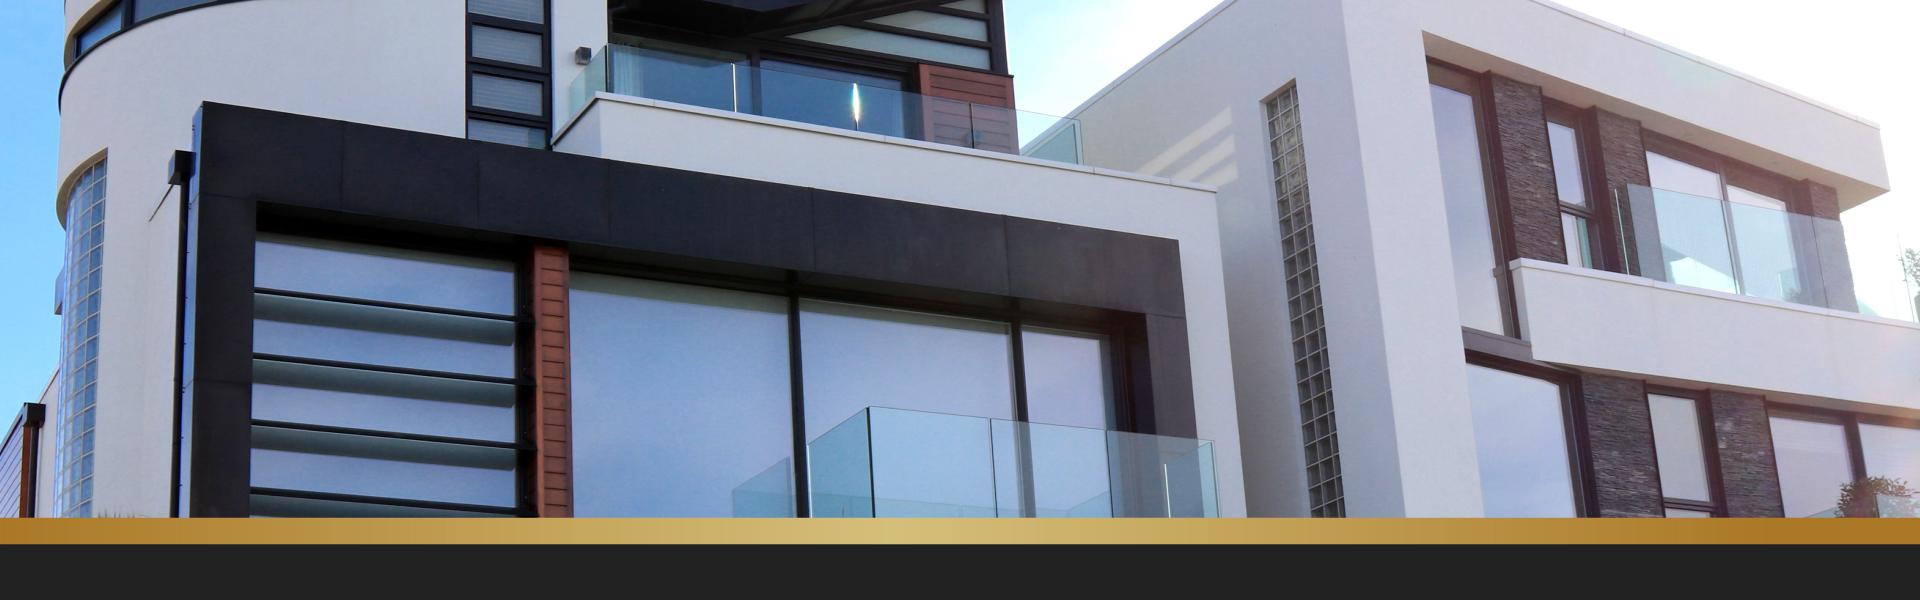 Empresa Inmobiliaria Digital